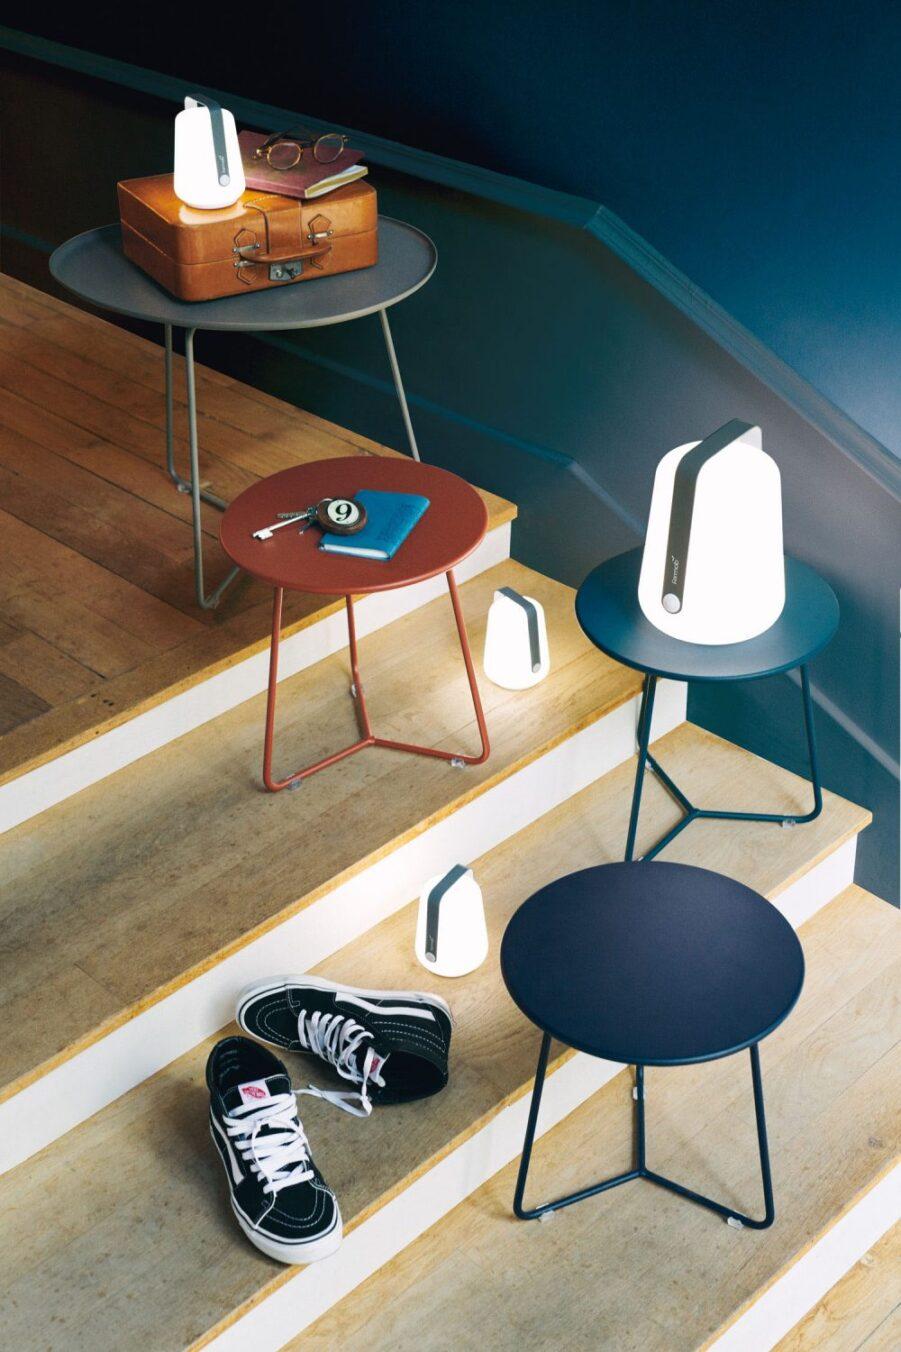 Miljöbild på Cocotte sidobord med Balad lampa.